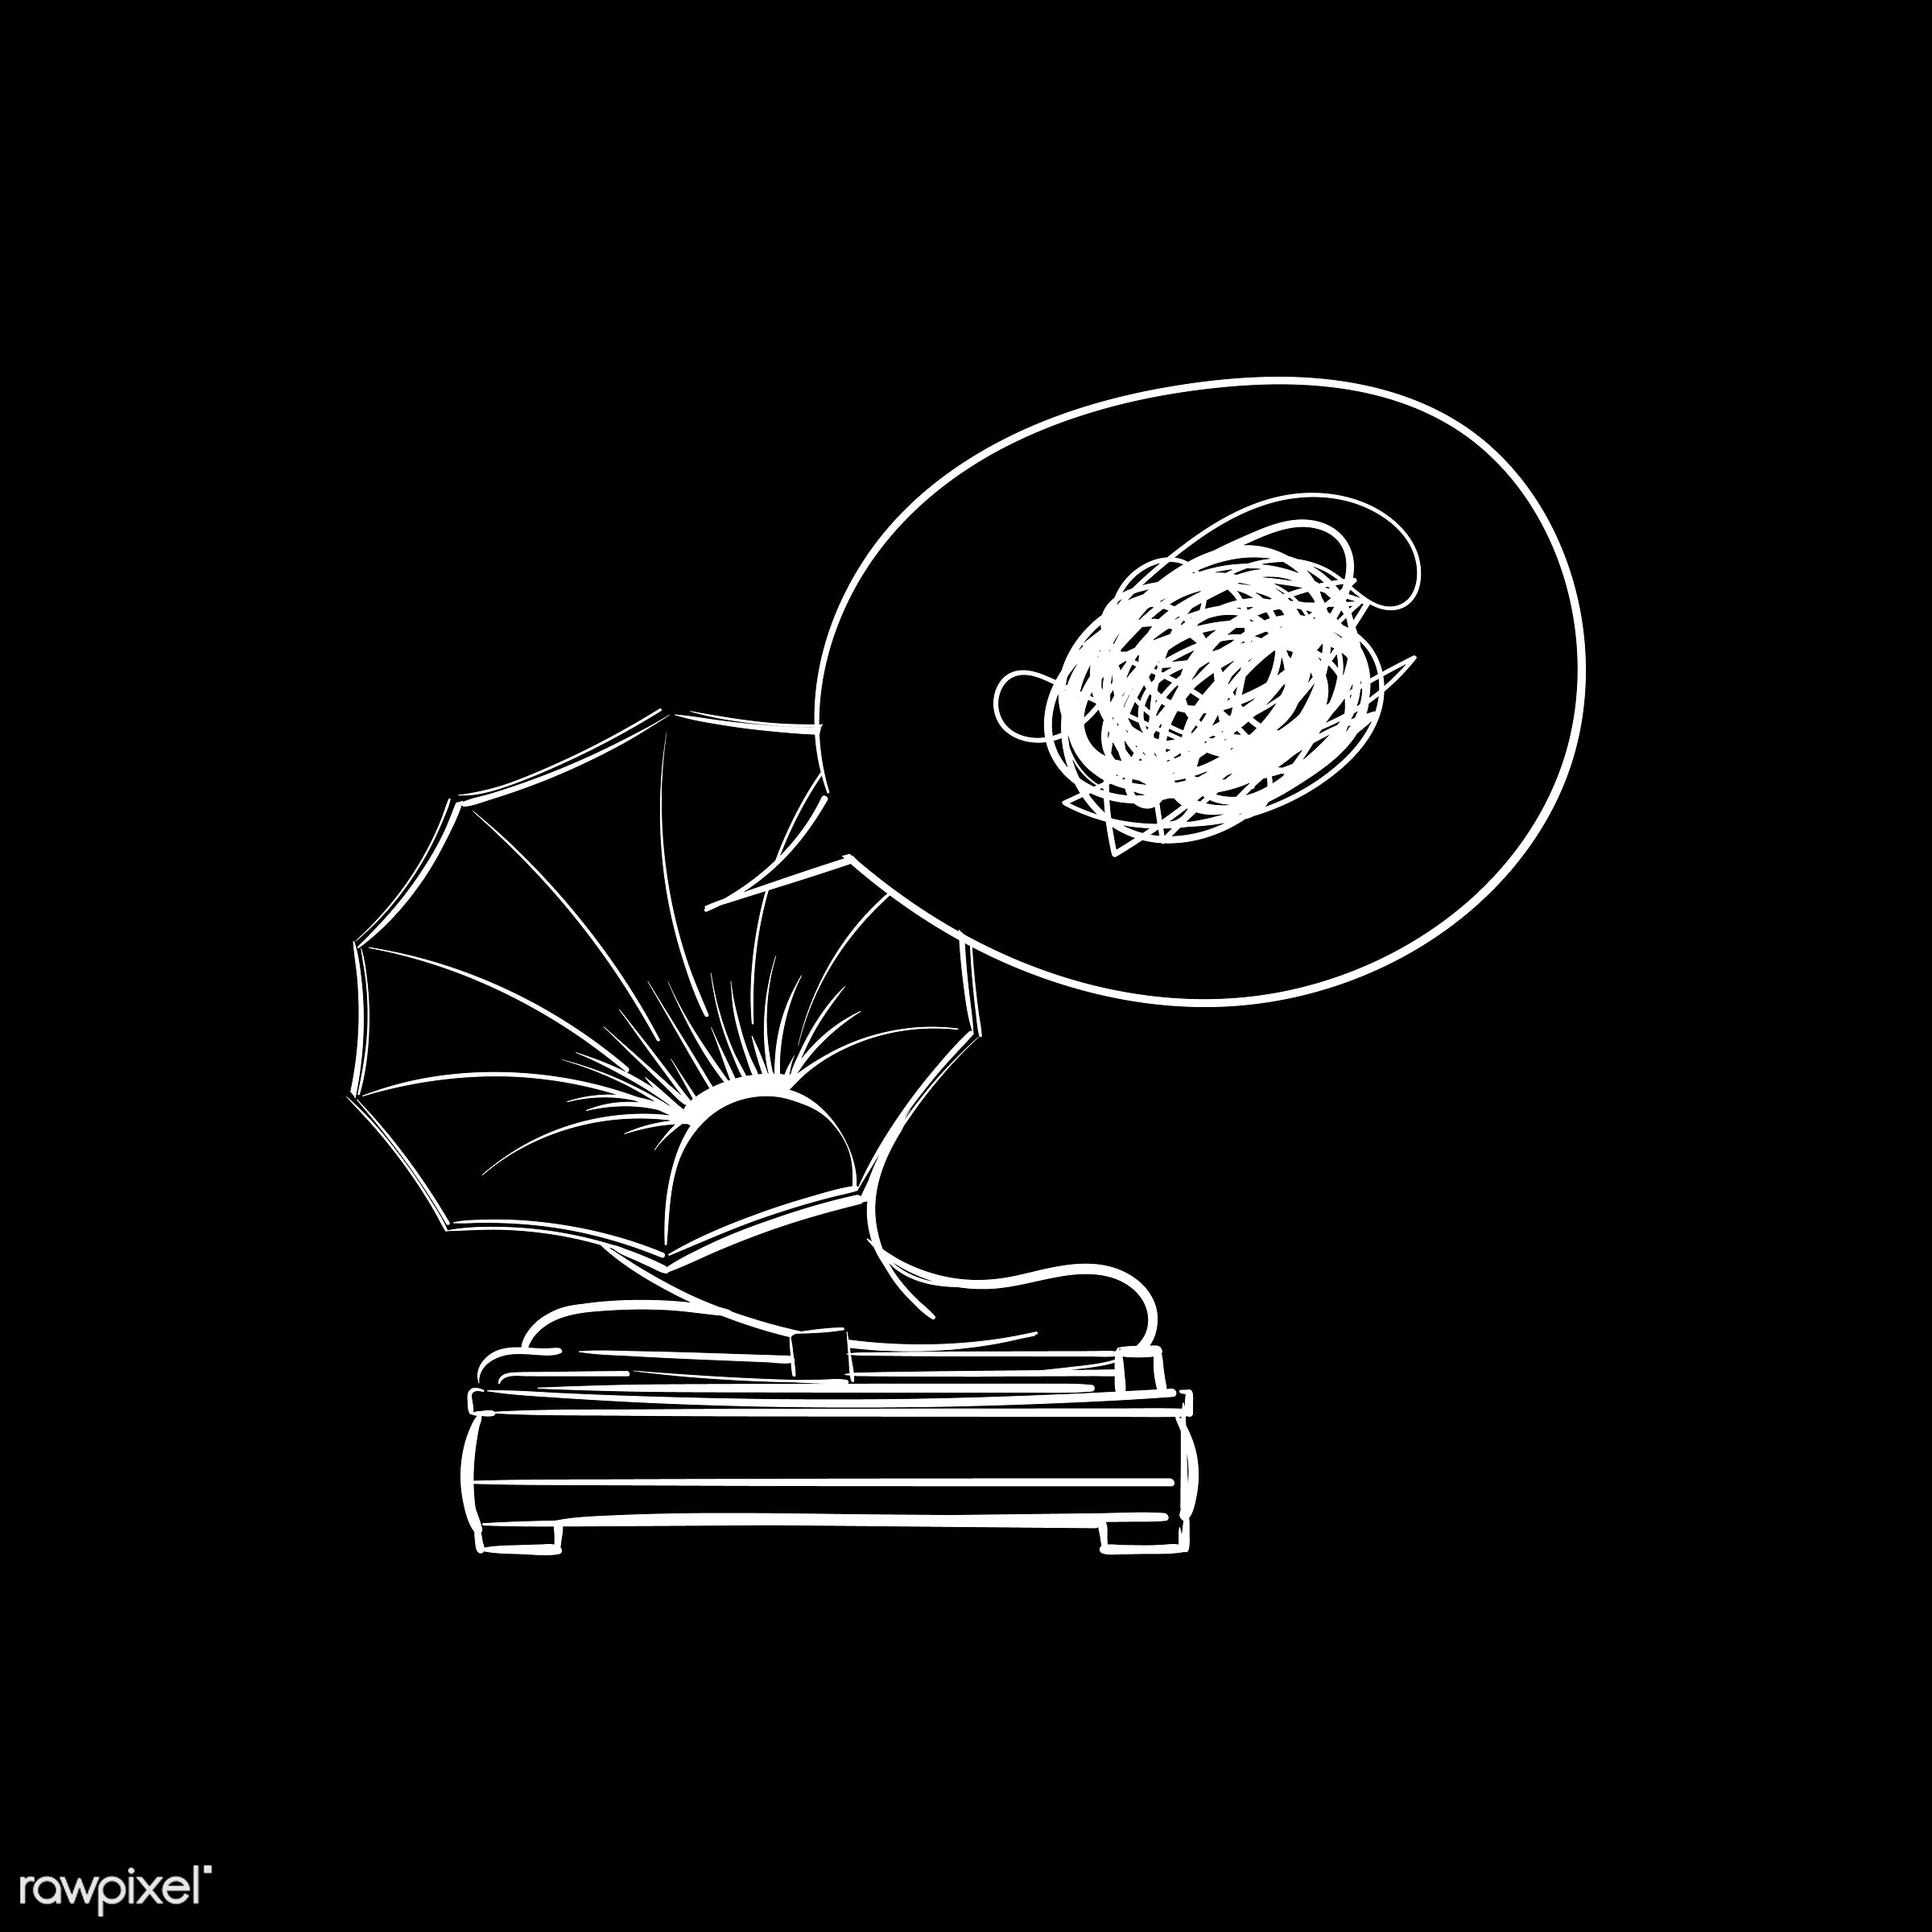 Hand drawing illustration of music entertainment concept - art, artwork, cassette, classic, creative, creativity, design,...